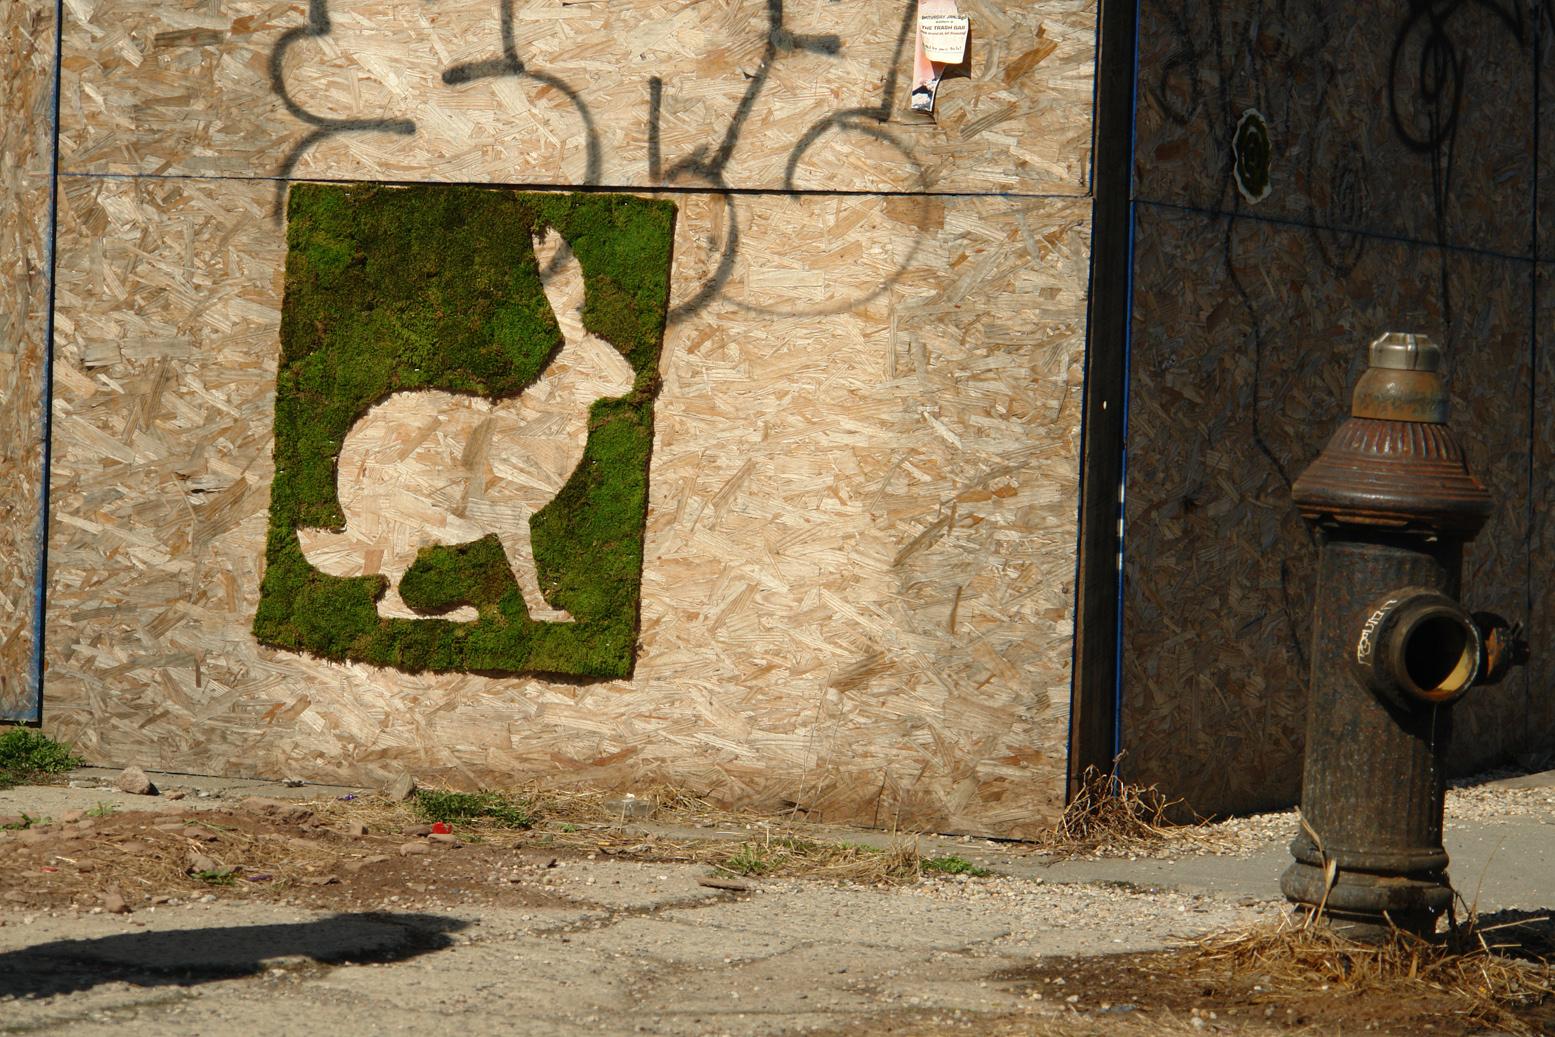 Green Street Art - Edina Tokodi aka Mosstika